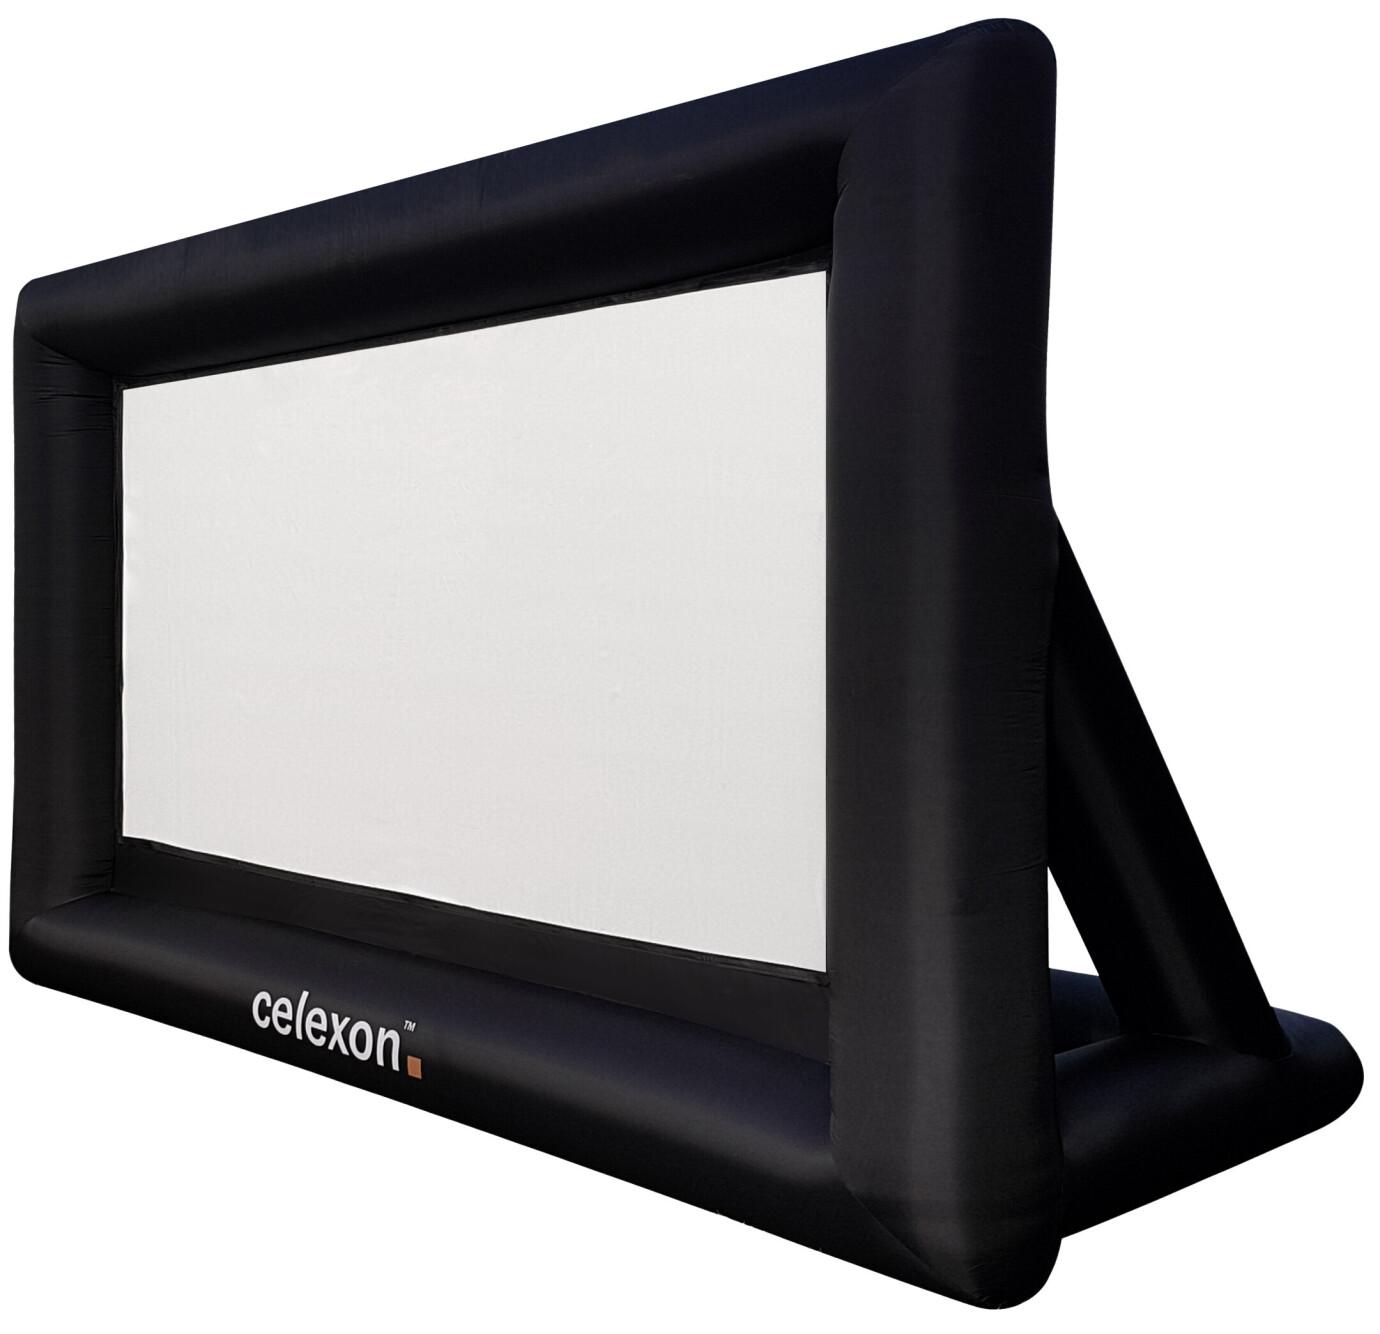 celexon inflatable outdoor screen INF200